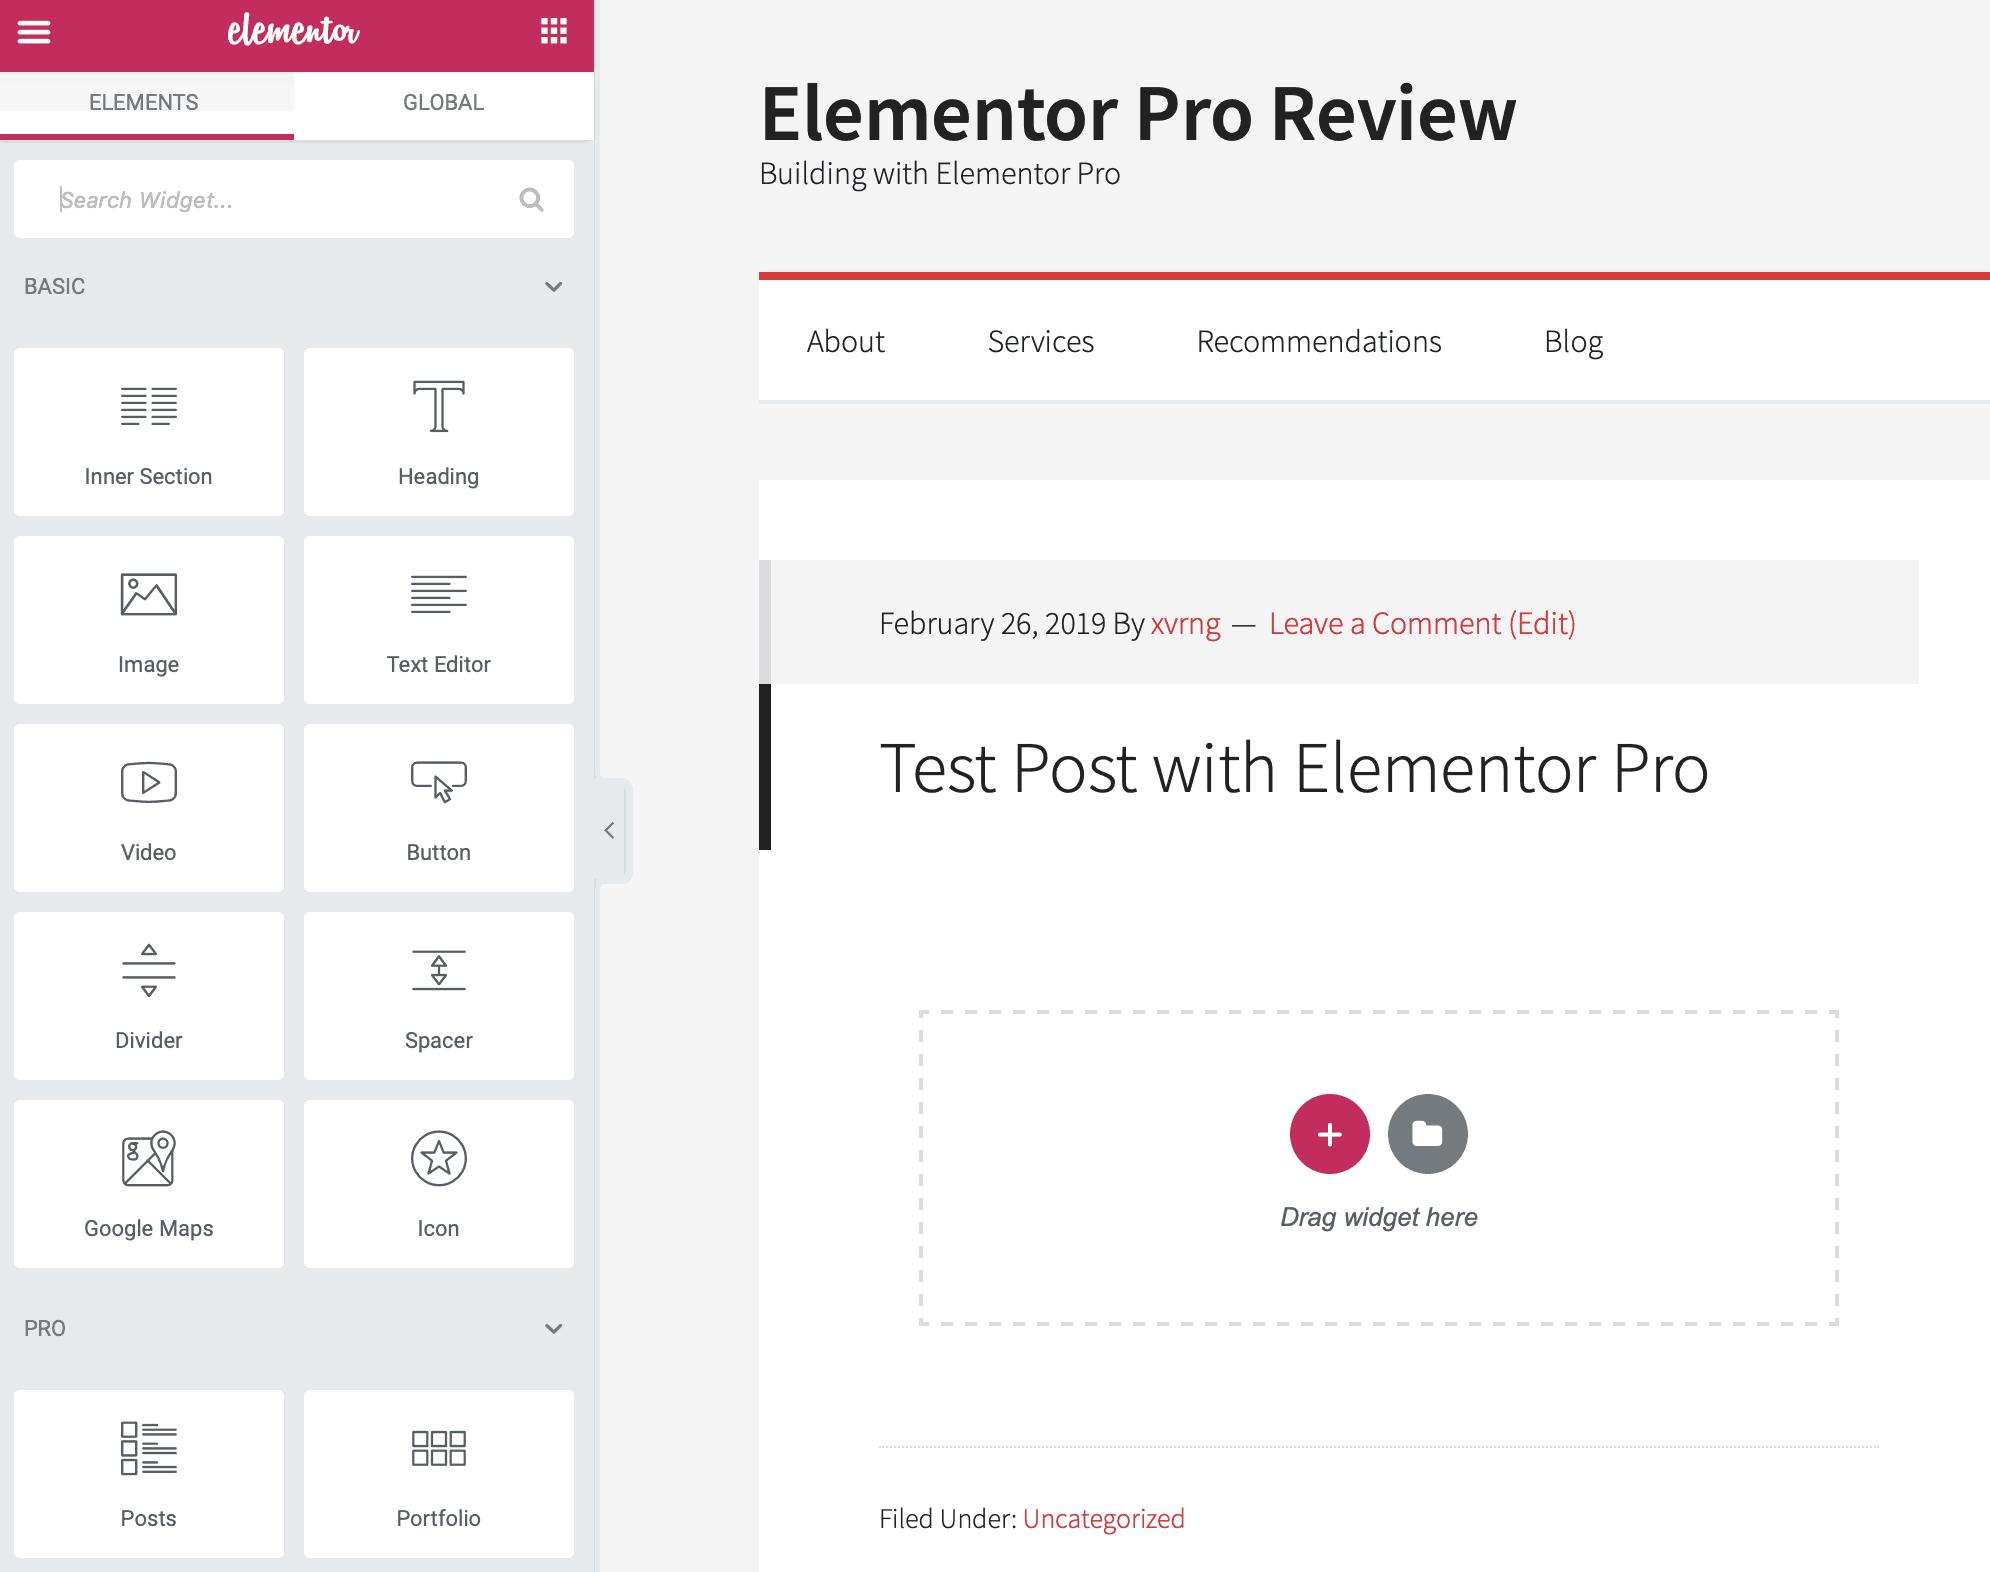 elementor pro review ui start